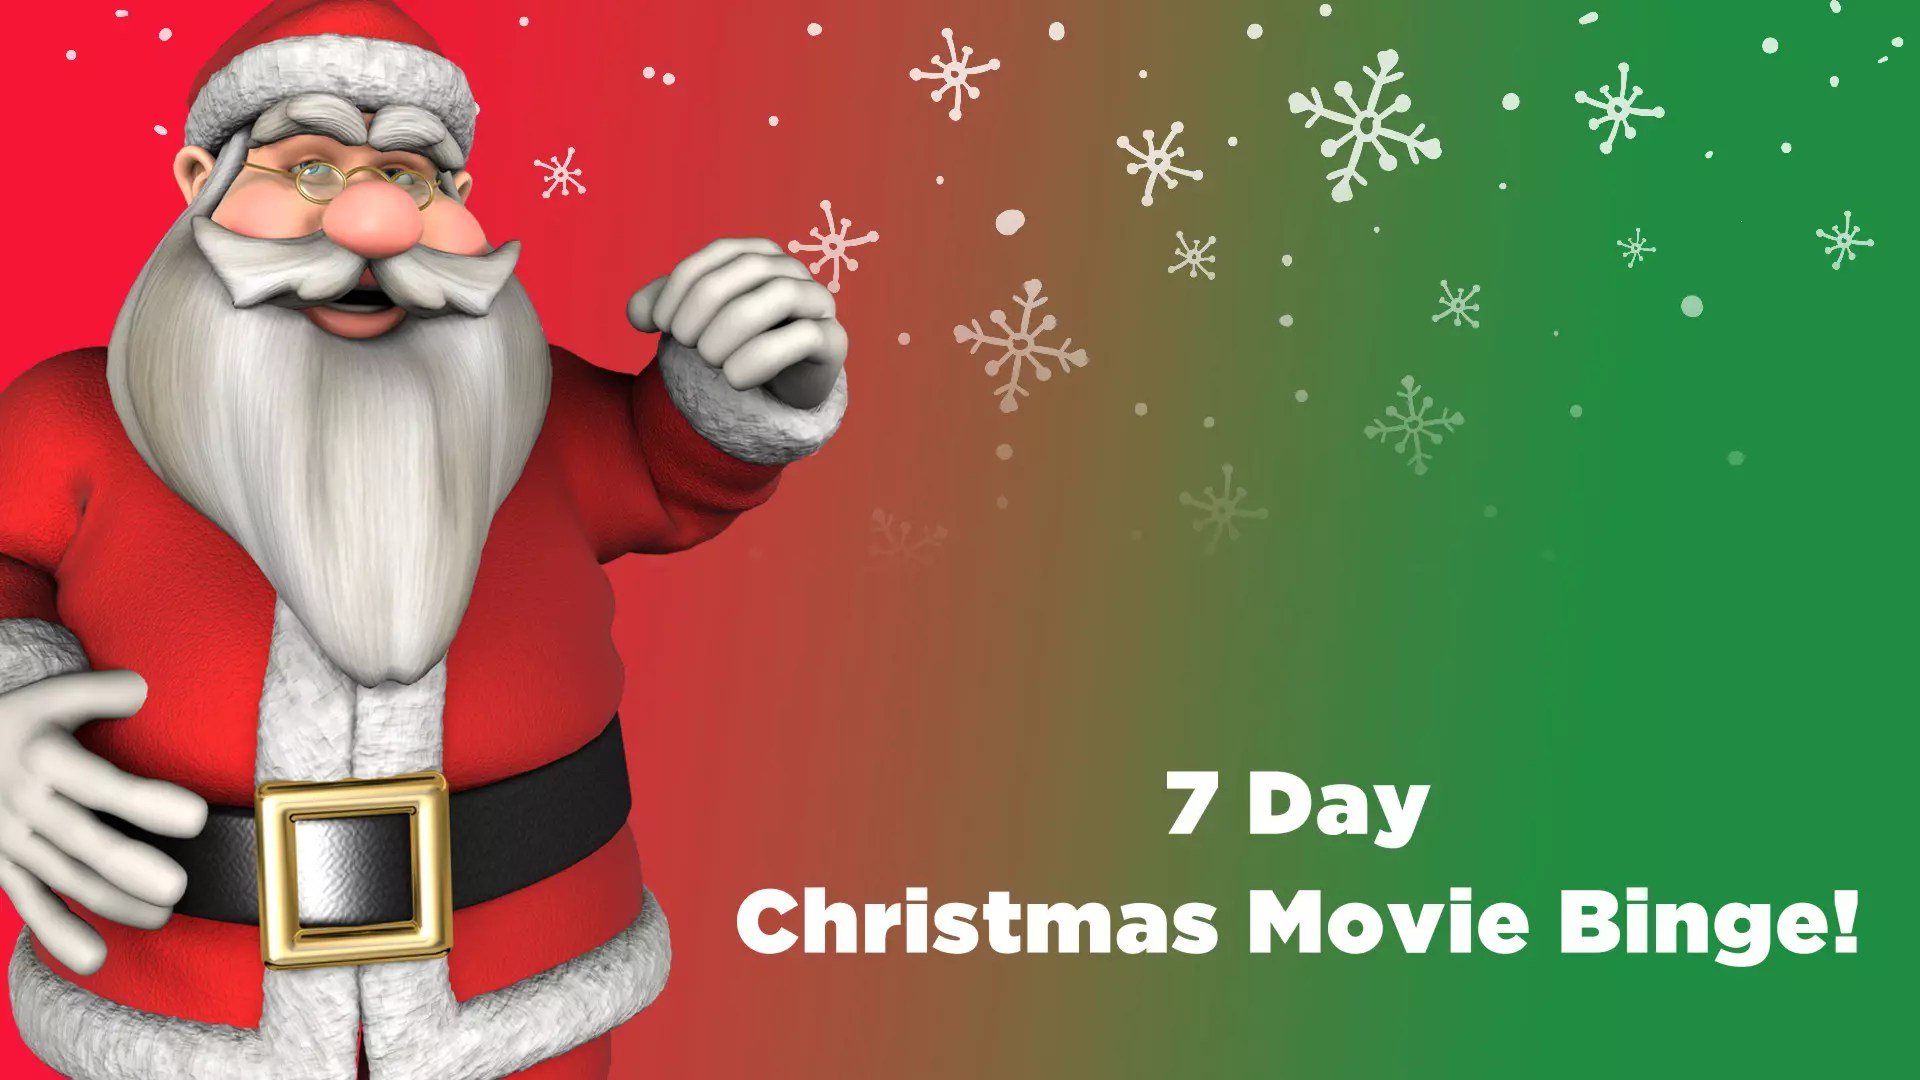 7 Day Netflix Christmas Movie Binge